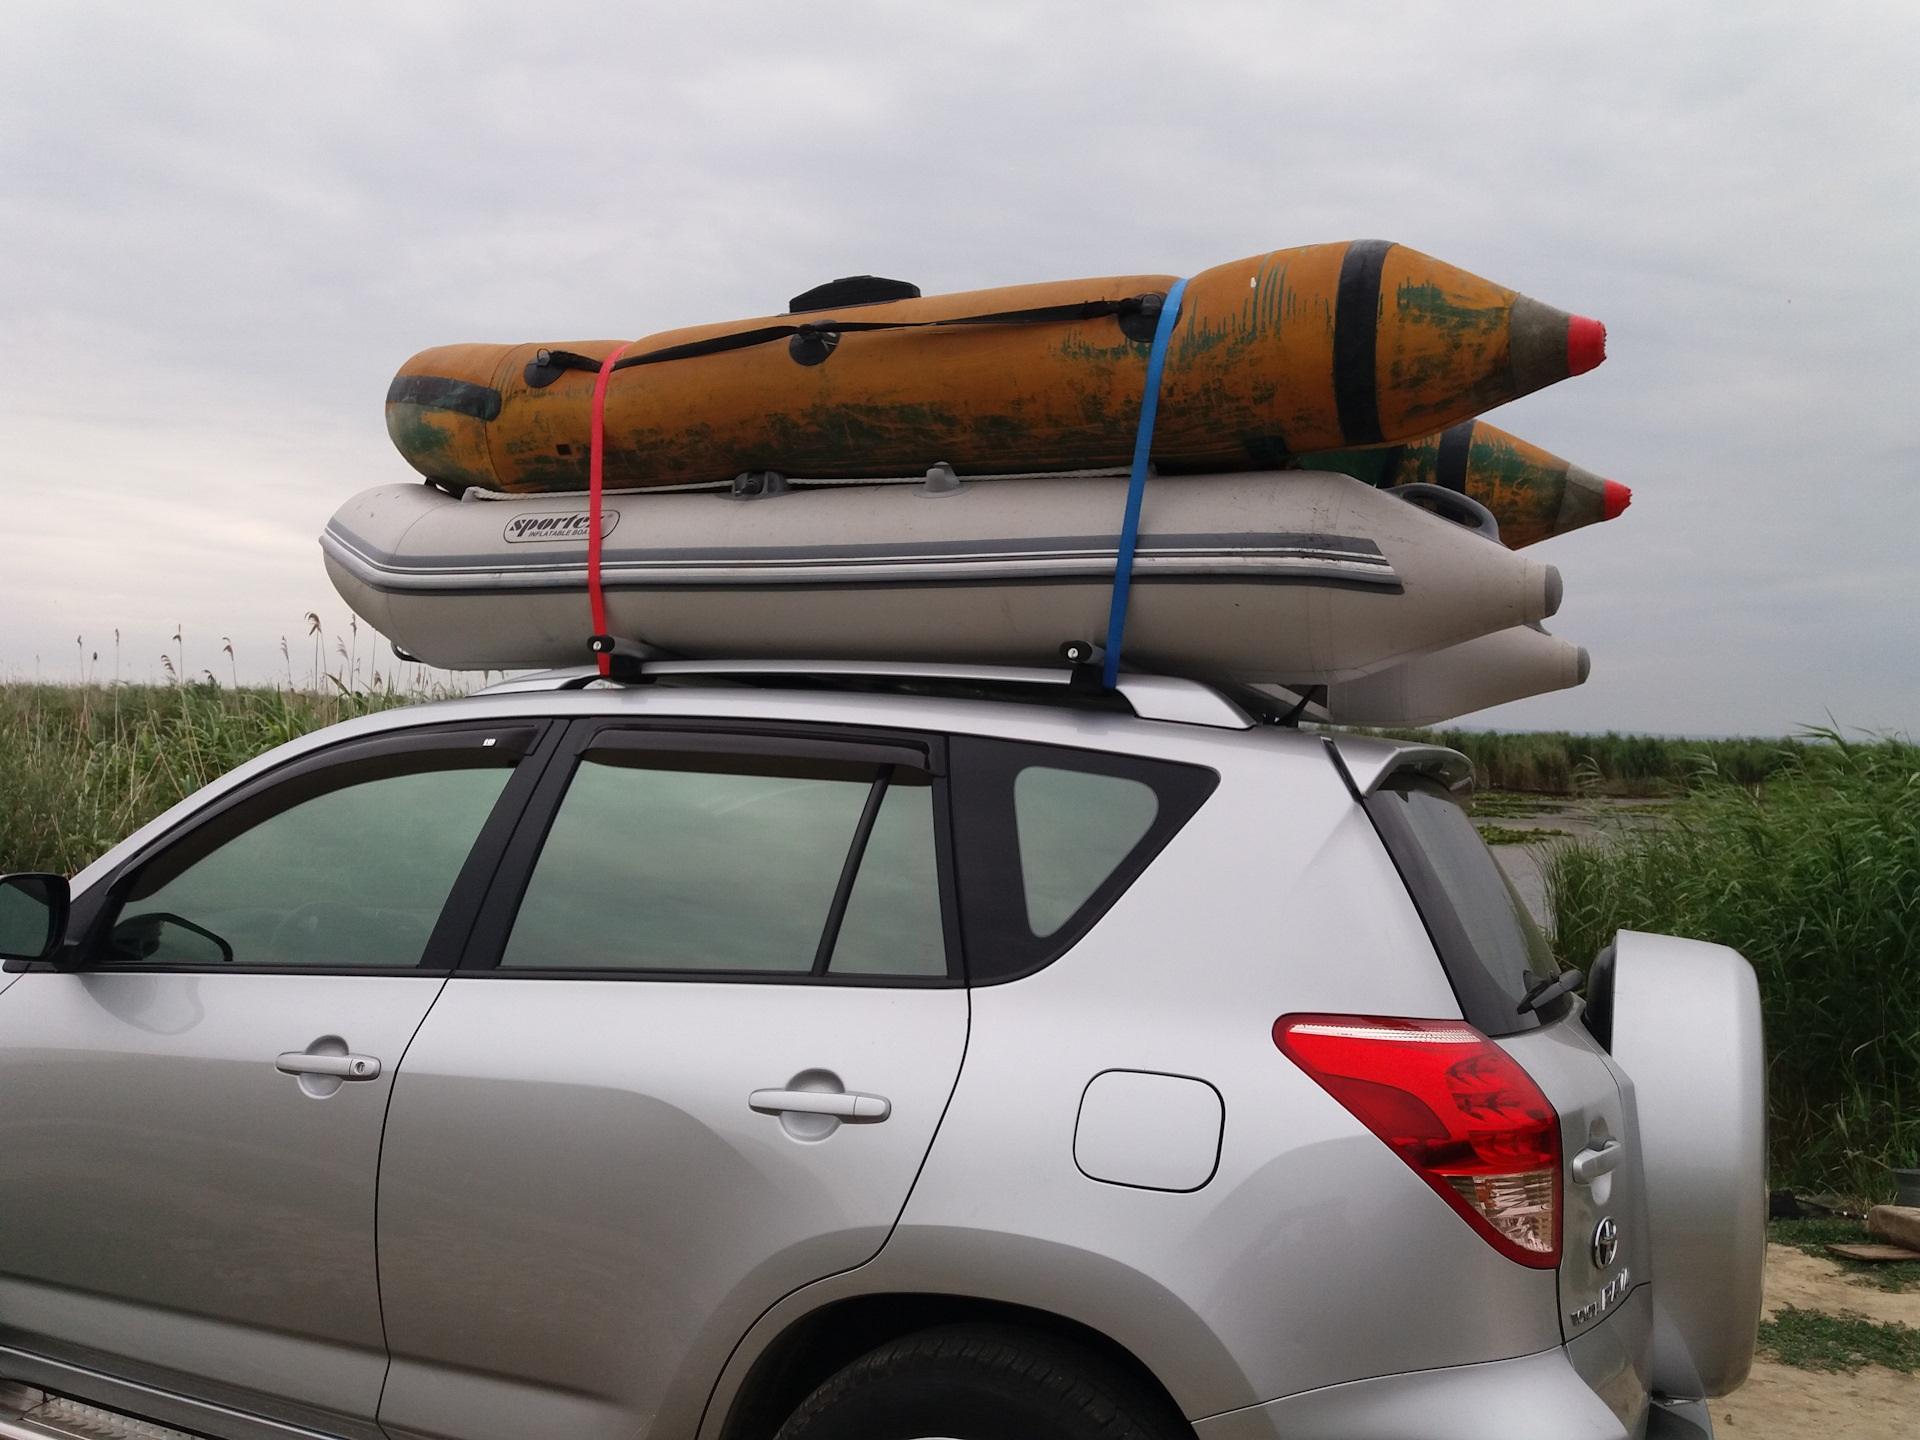 Лодка на багажнике автомобиля